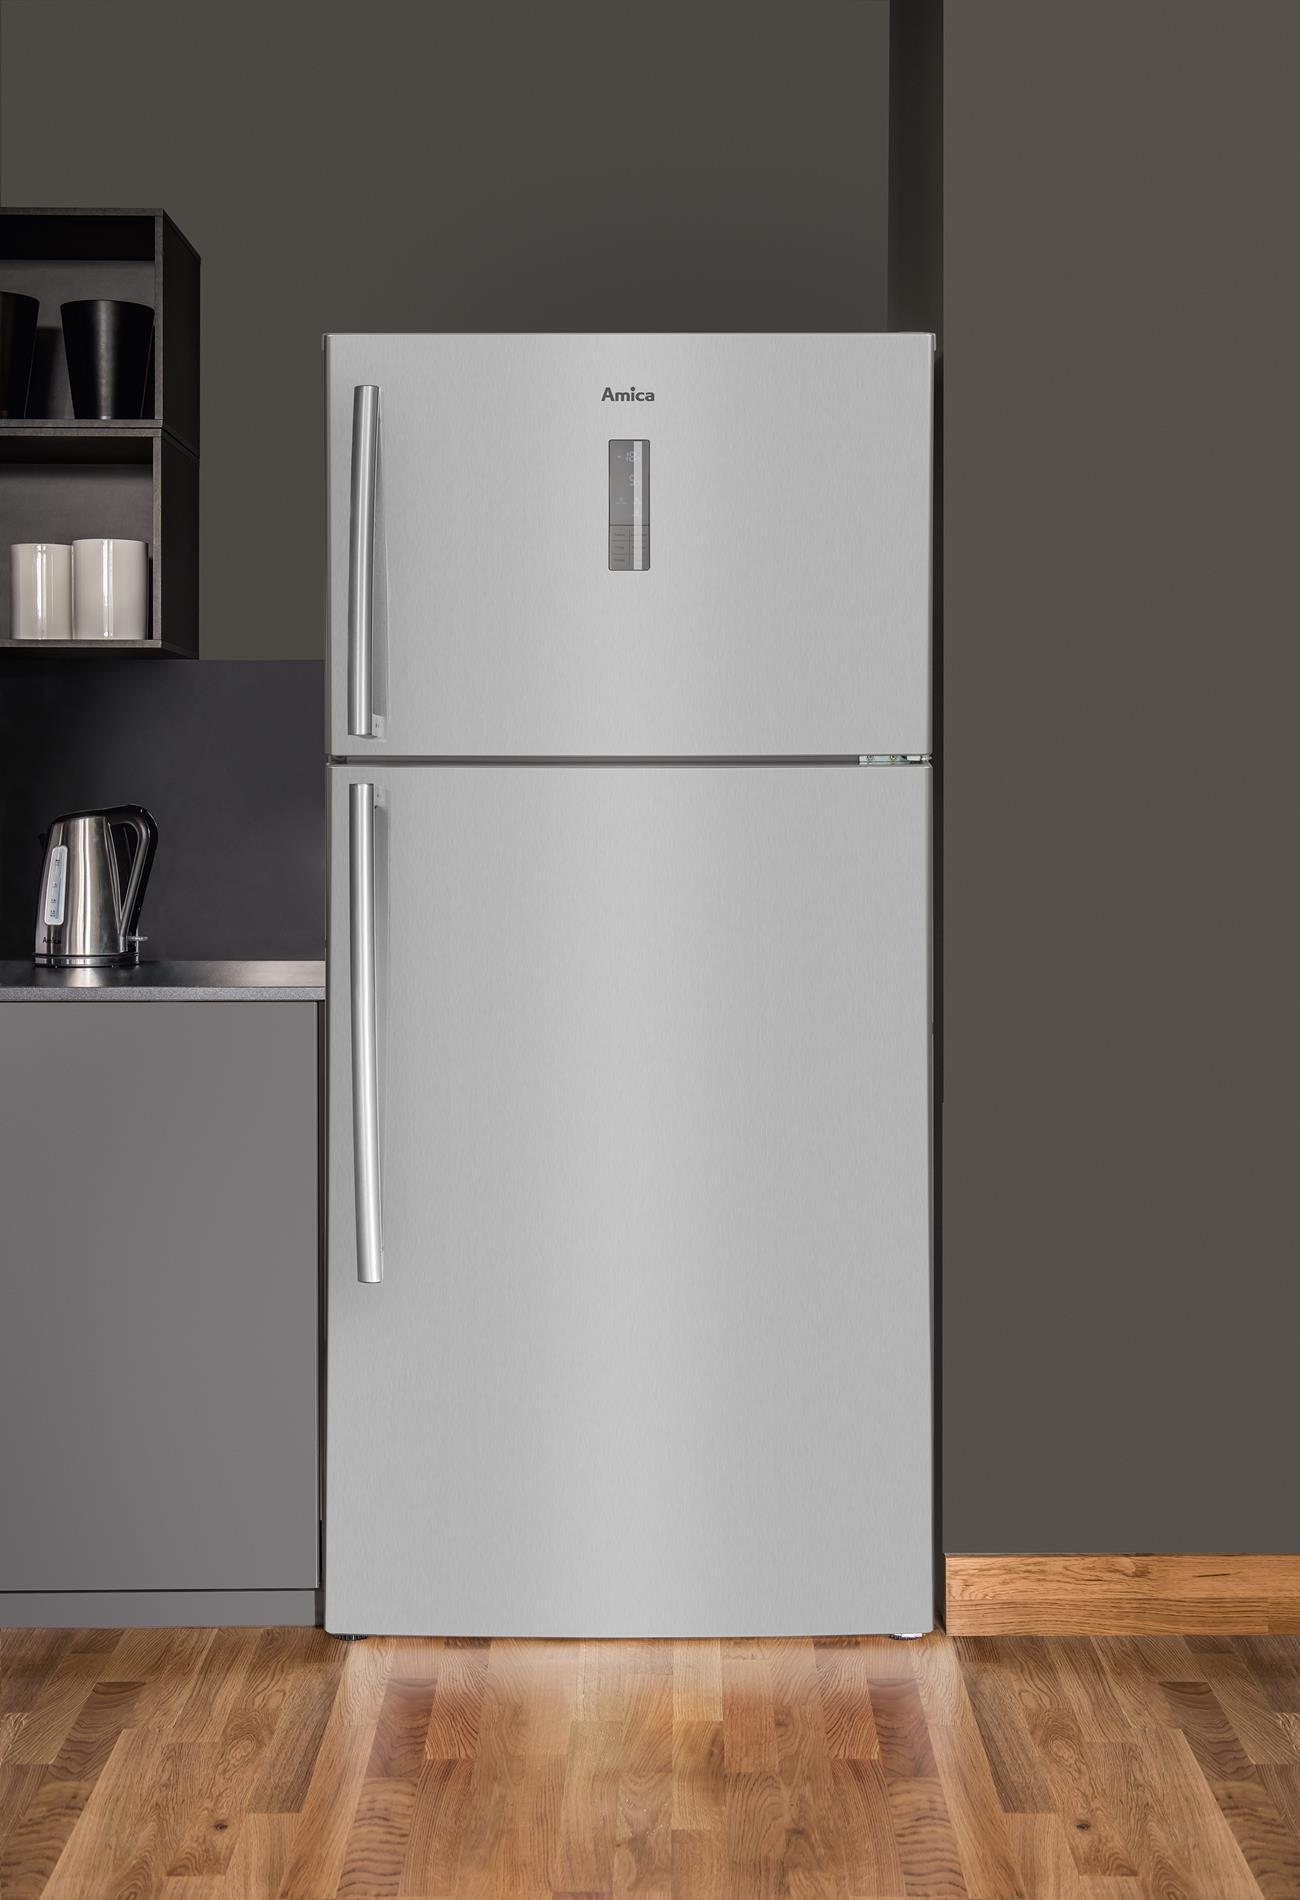 Free Standing Fridge Freezer With Freezer On Top Fd4328